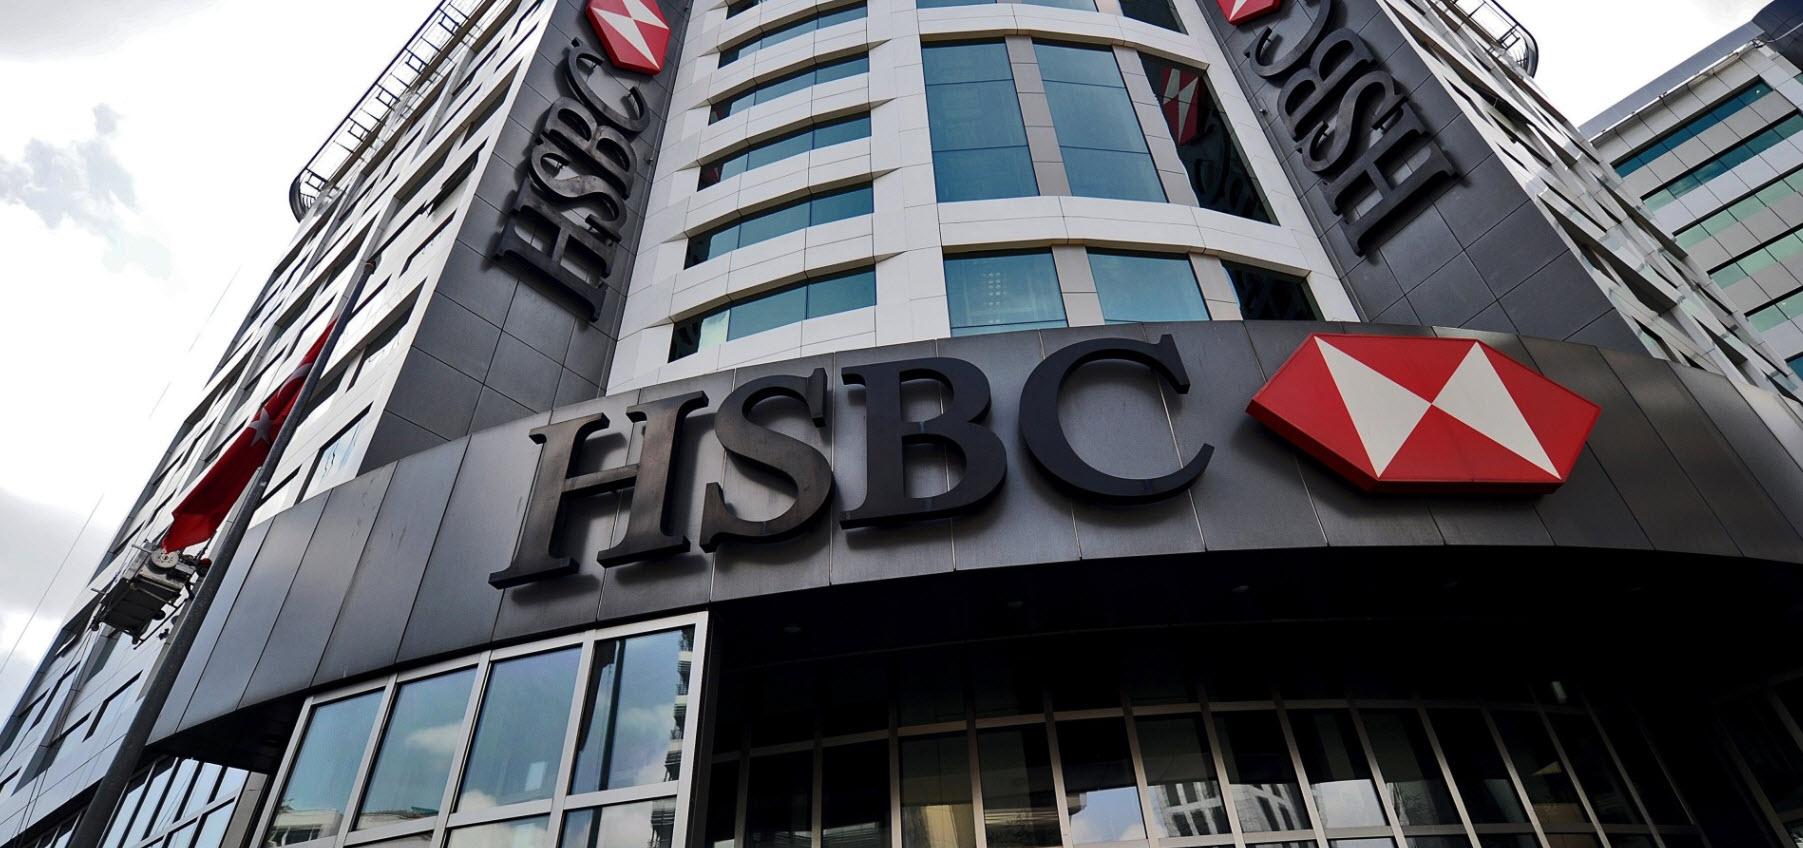 HSBC Bank Customer Service Contact Number: 0843 837 5451